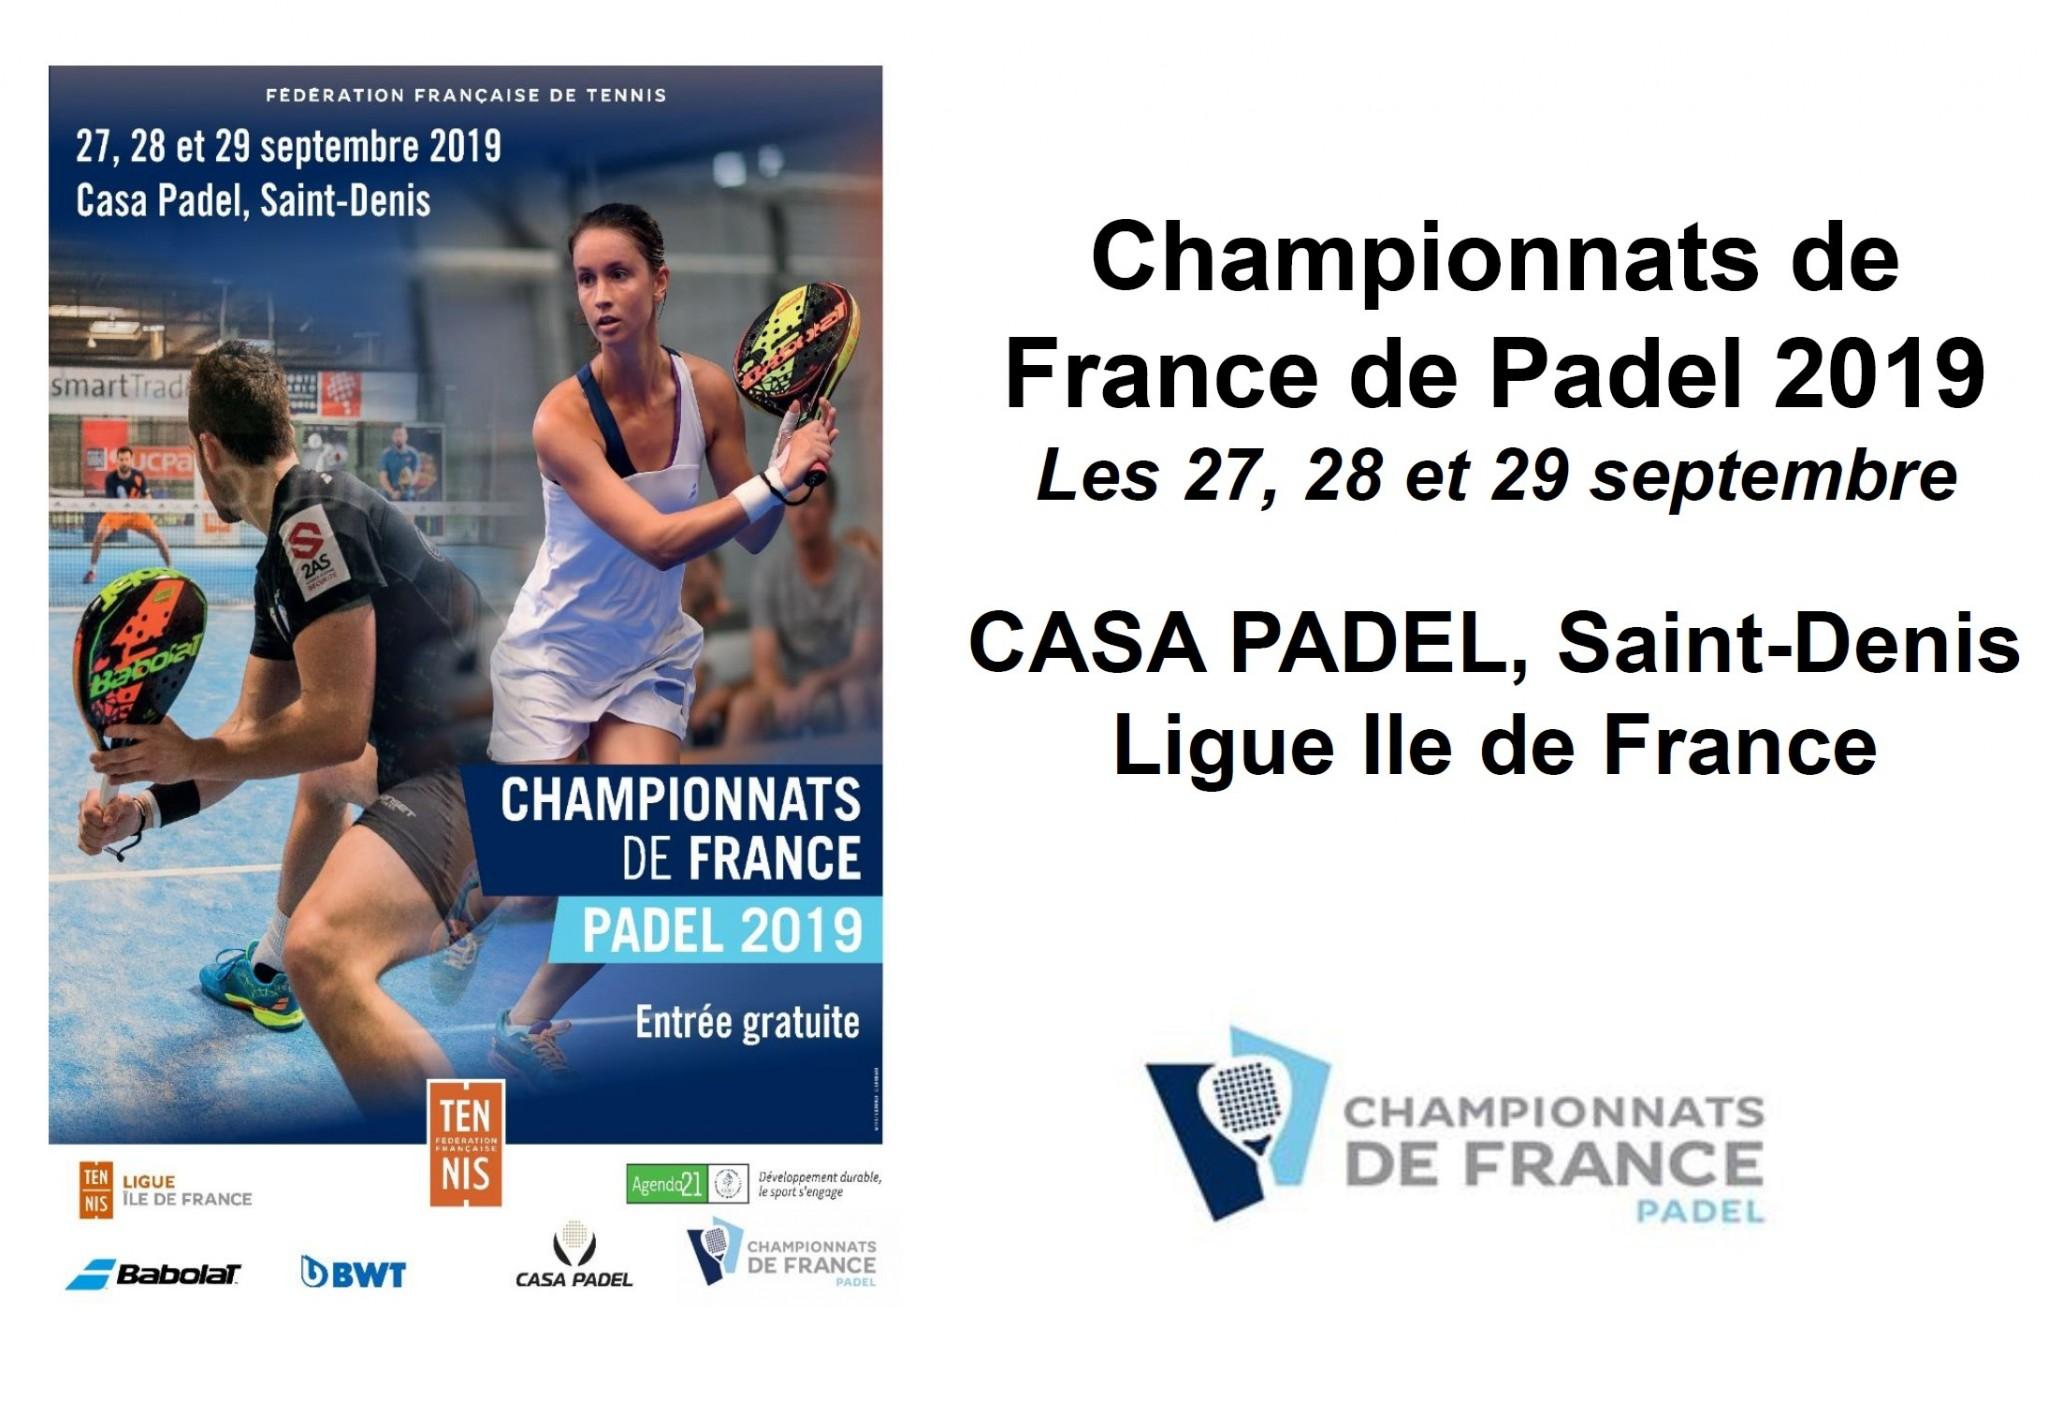 Campionati francesi padel 2019 - Come qualificarsi